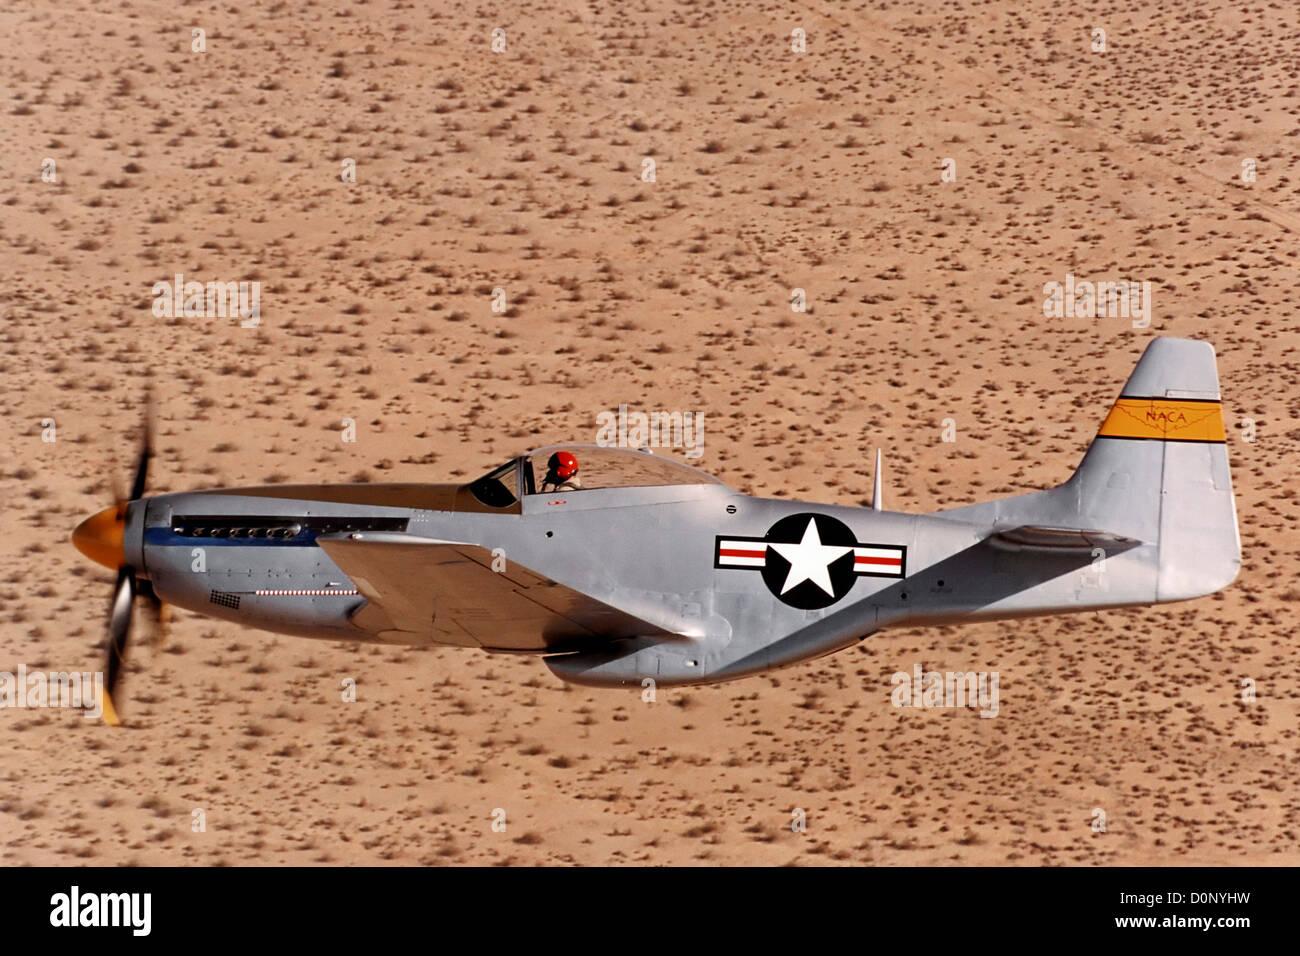 P-51 Mustang - Stock Image